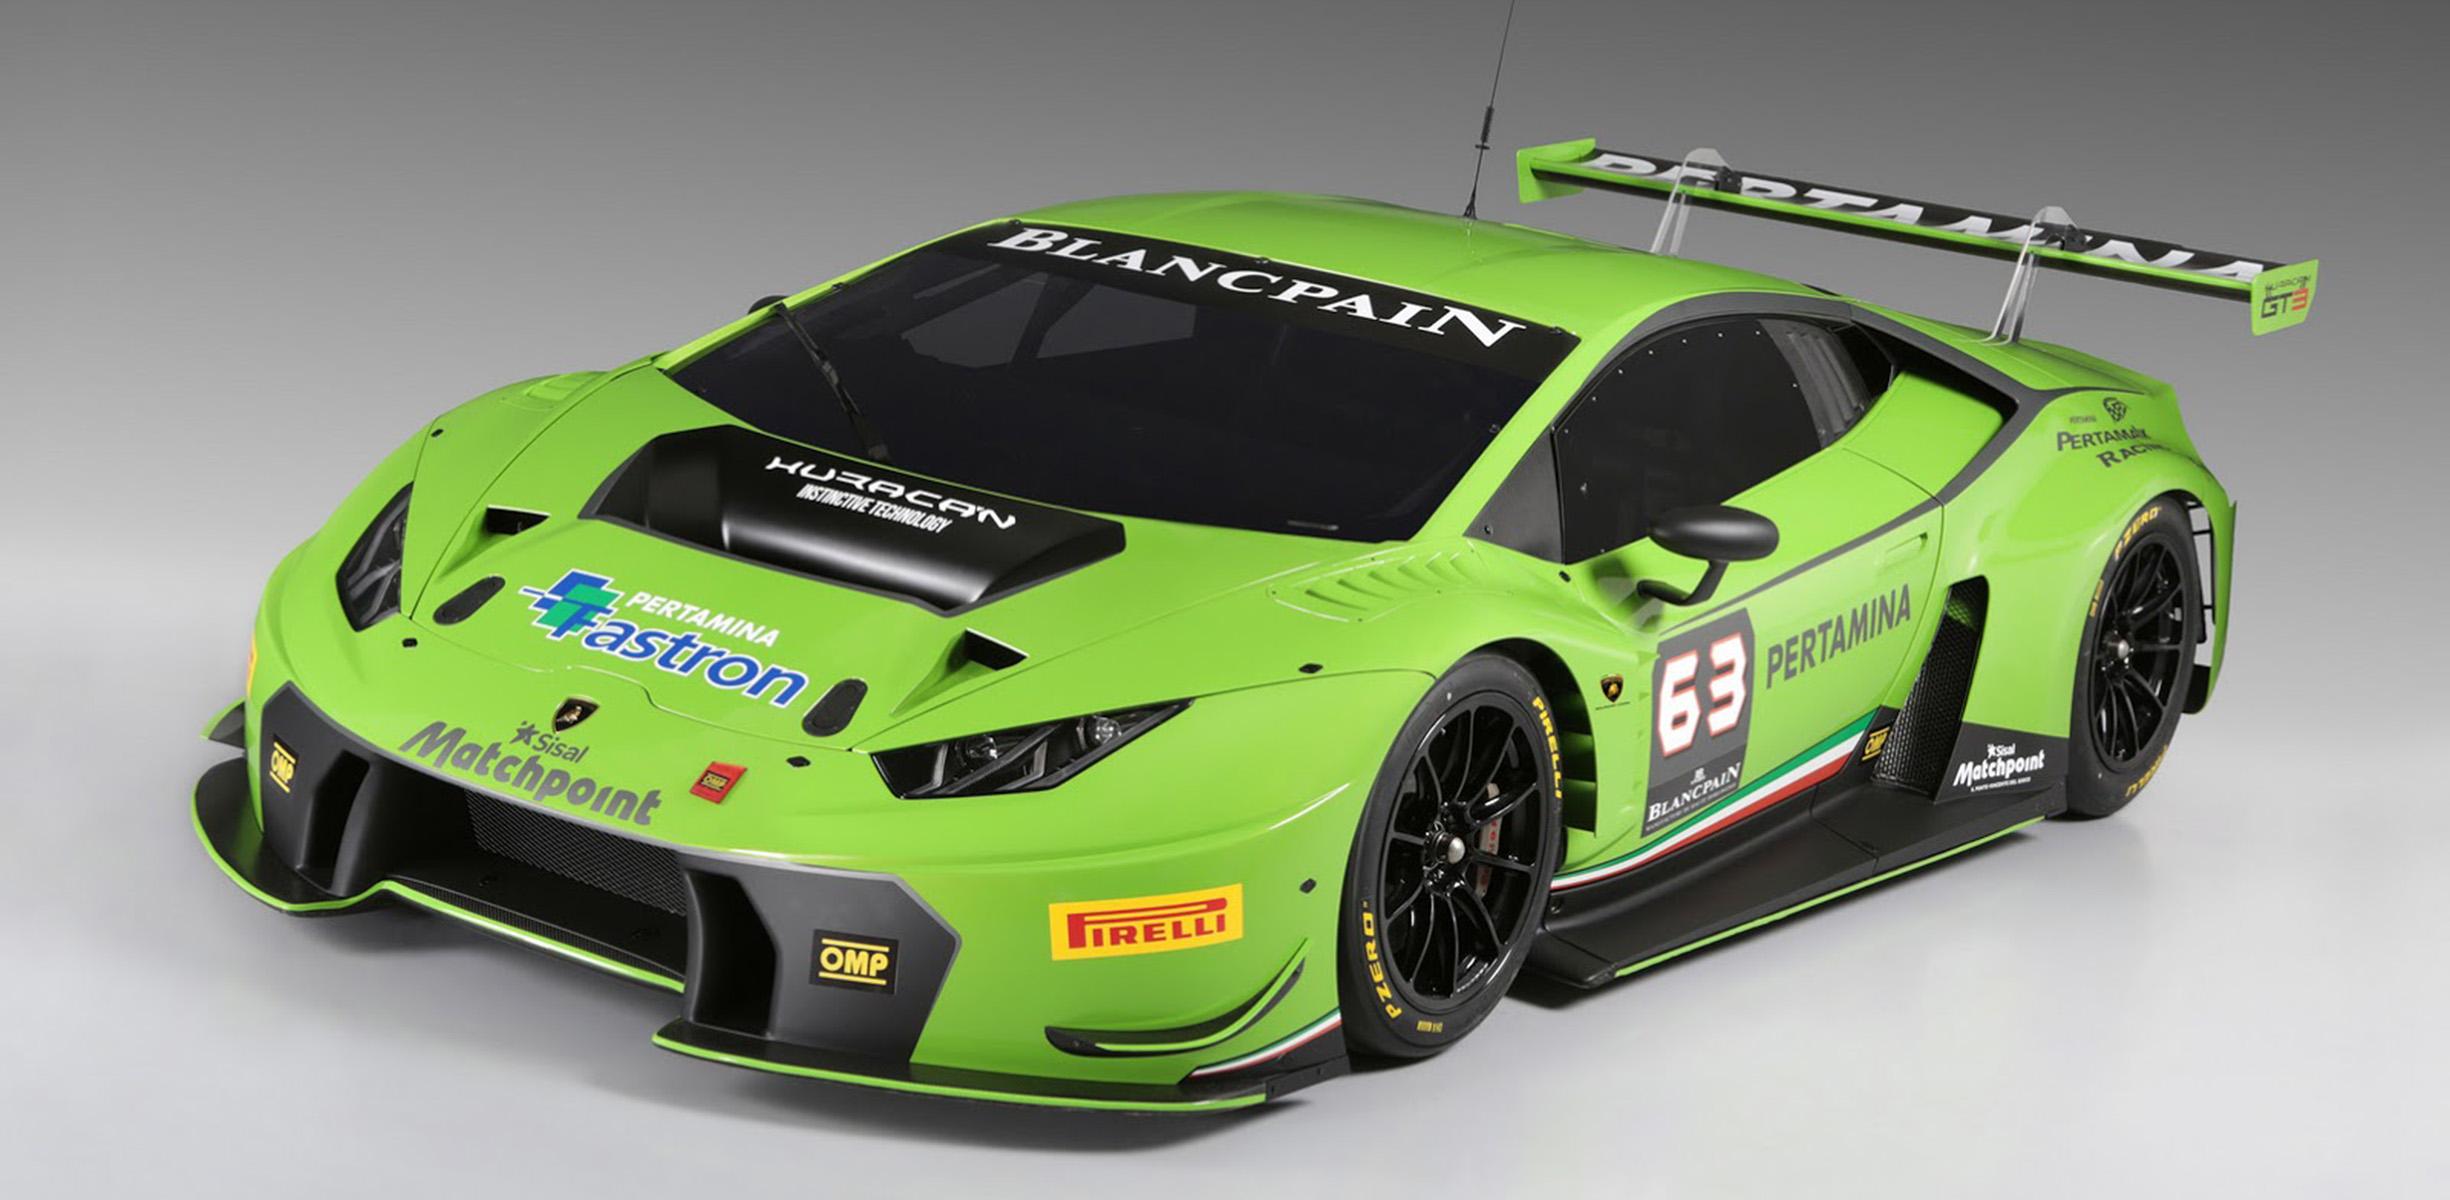 Lamborghini Huracan GT3: Rear Wheel Drive Racing Coupe Unveiled